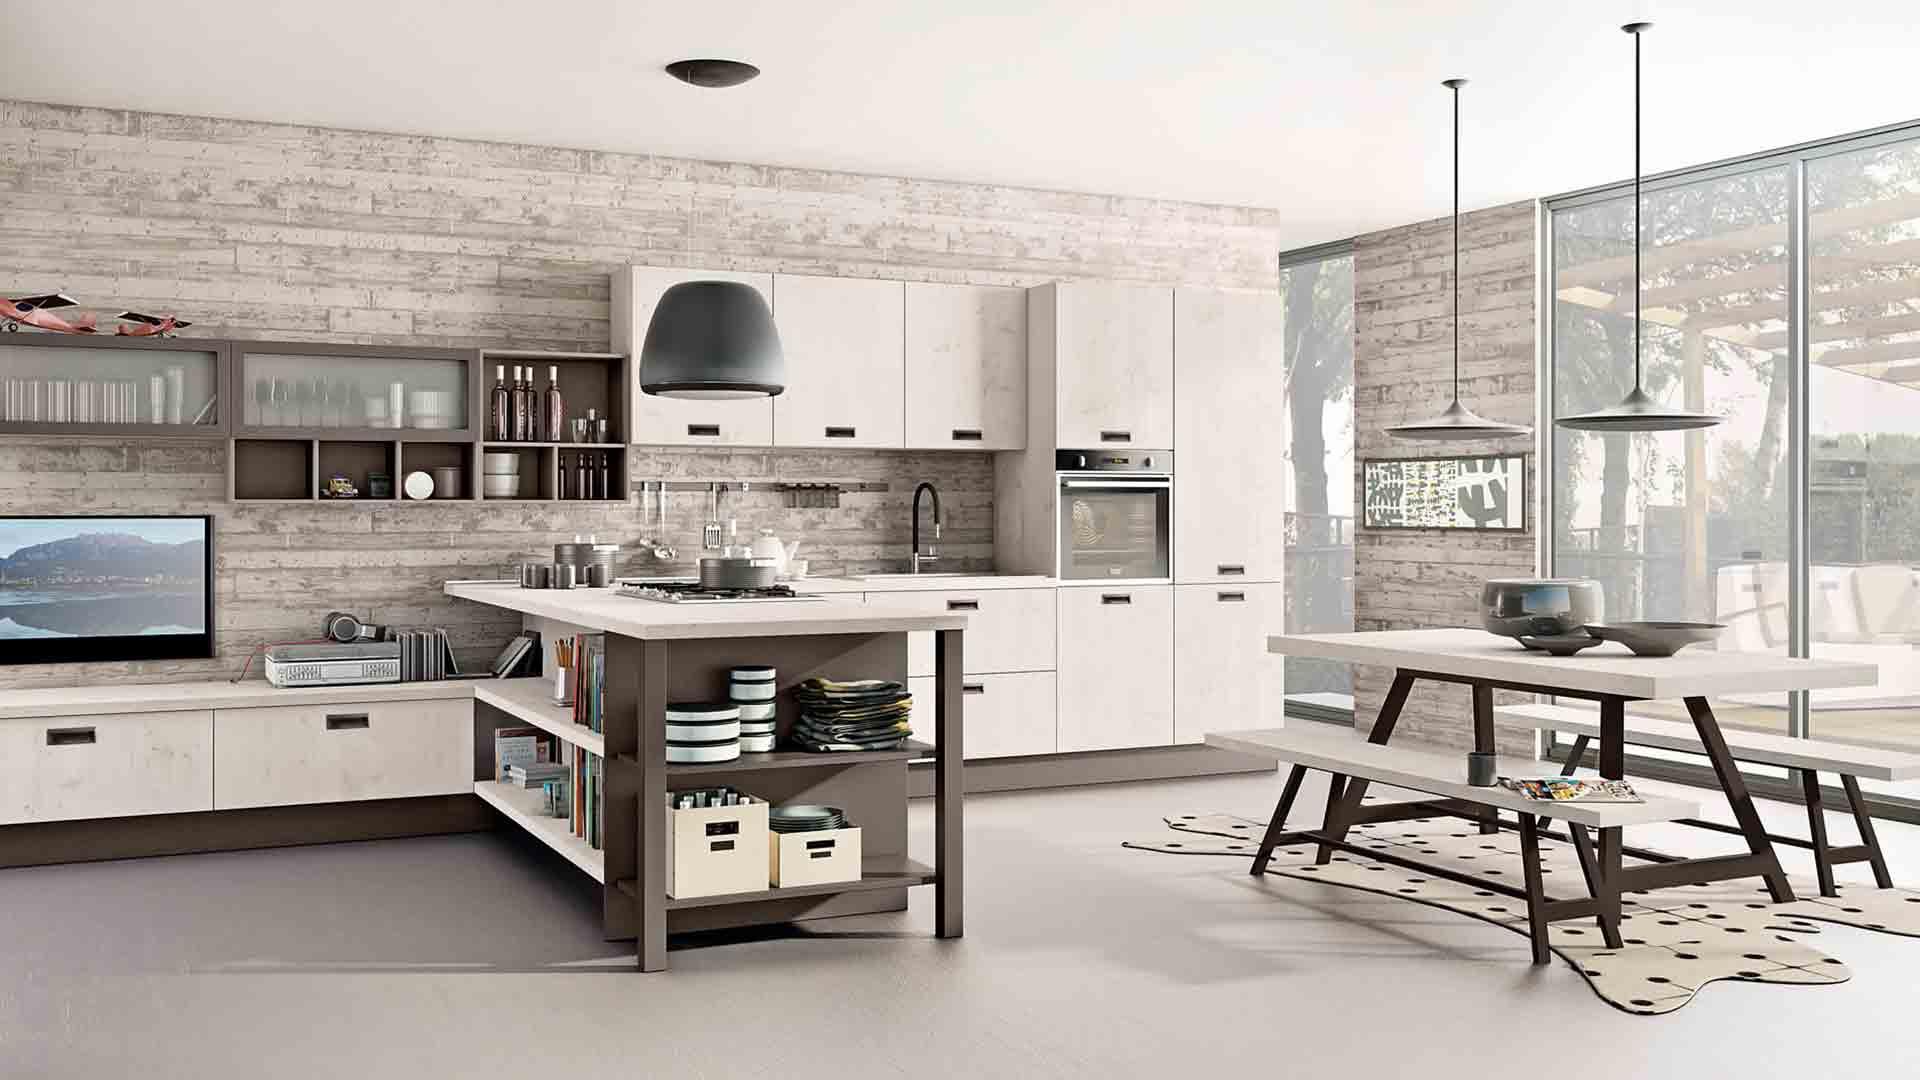 Kyra - Cucine Moderne - Creo Kitchens